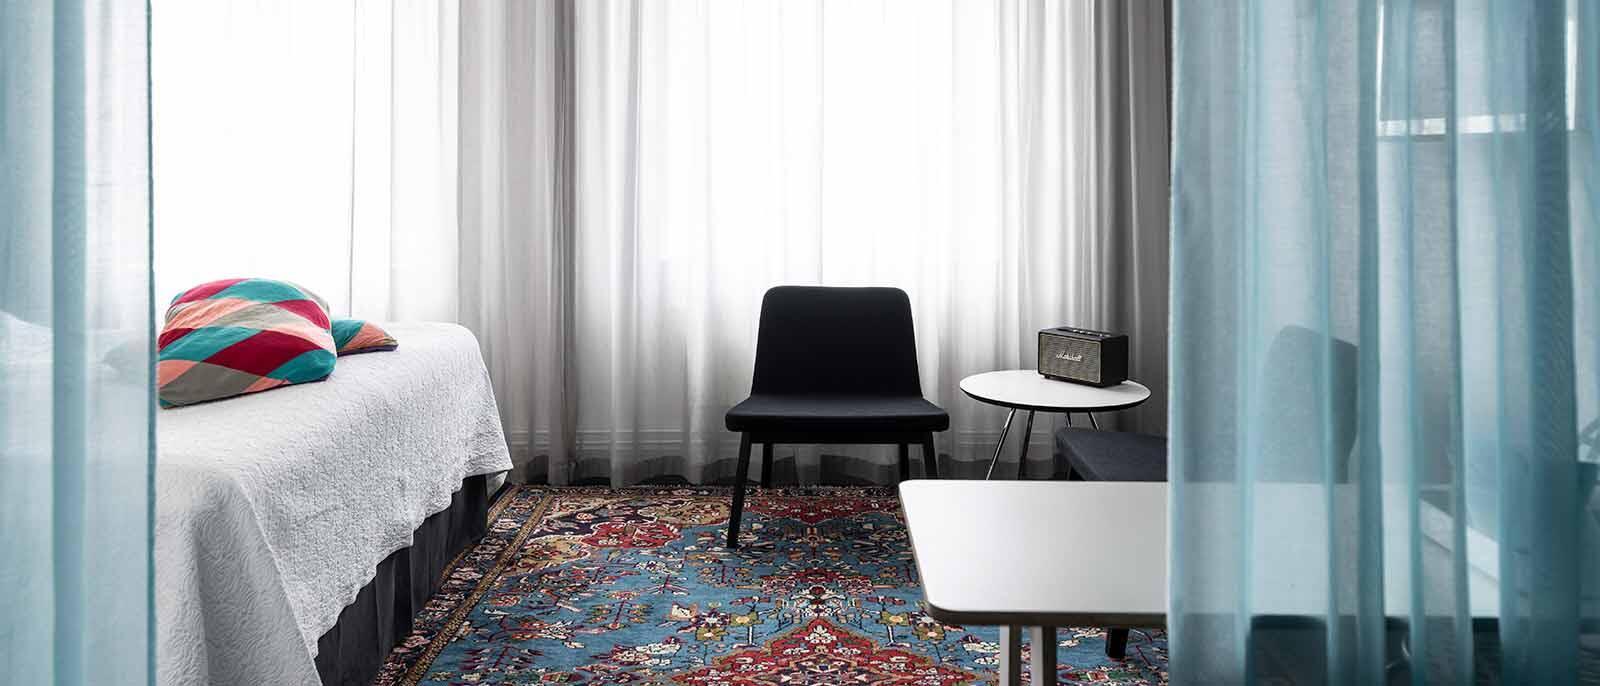 Rooms at Hotel Flora in Gothenburg, Sweden